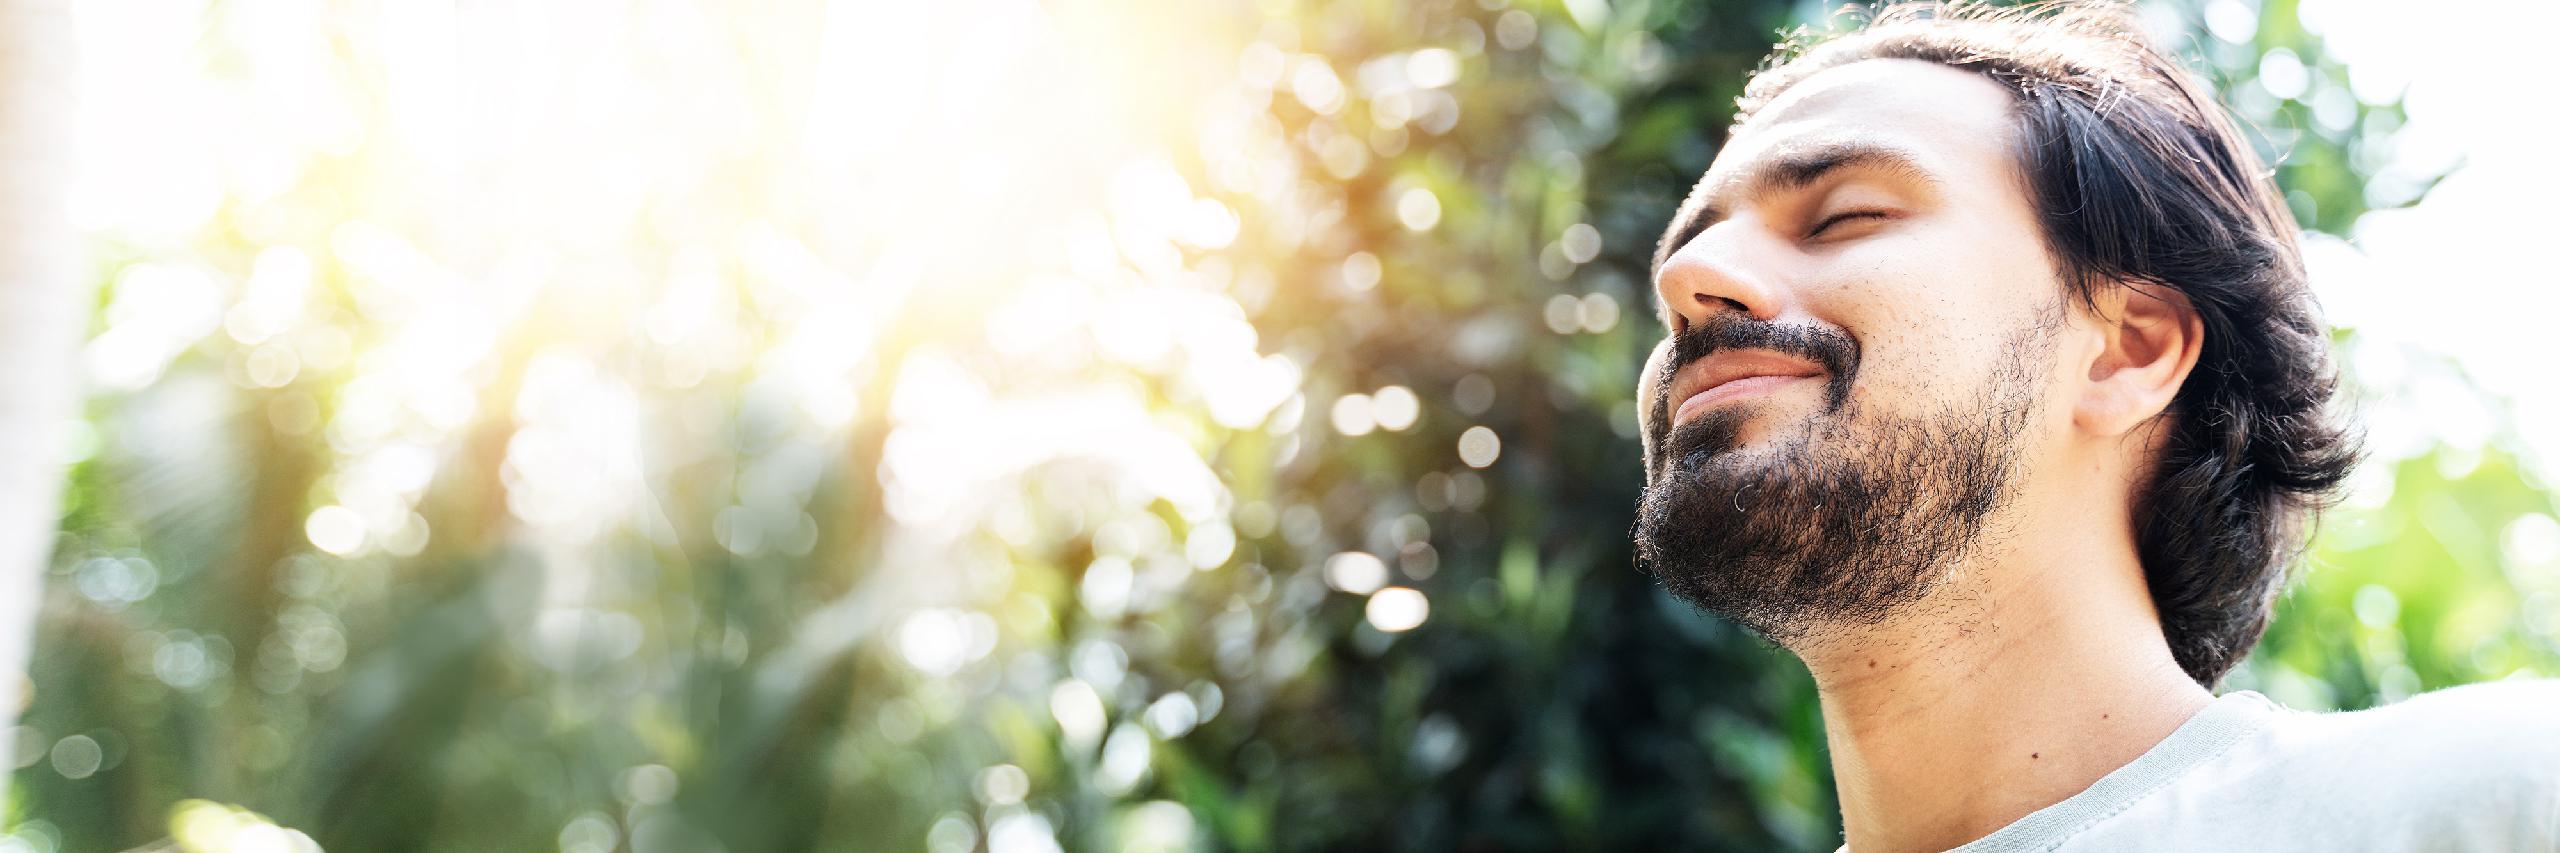 Holistic Healing: Islam's Legacy of Mental Health